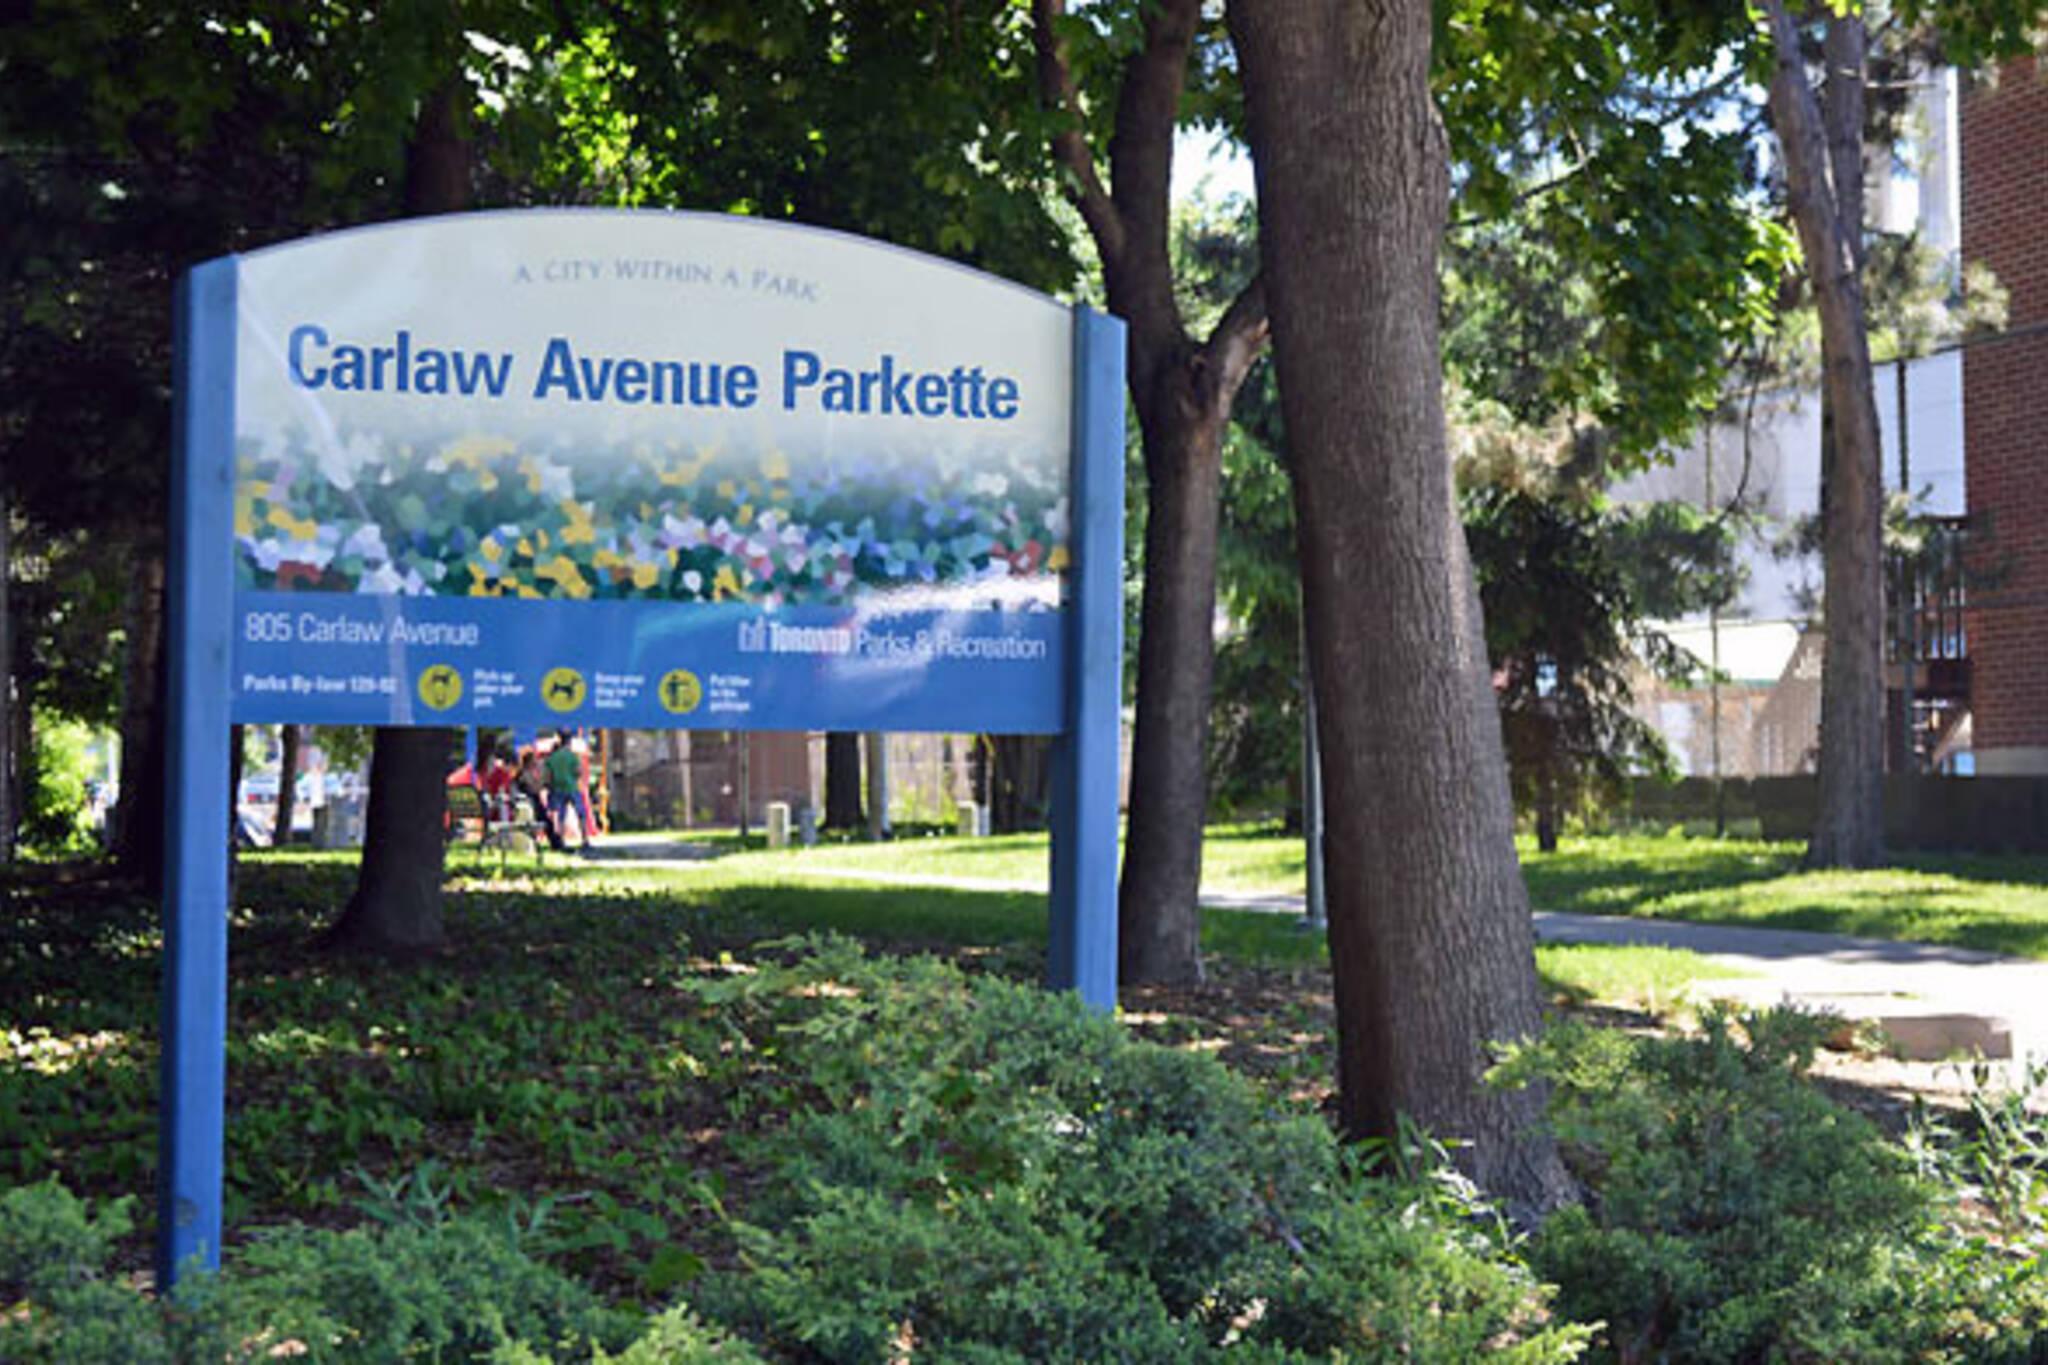 Danforth linear park